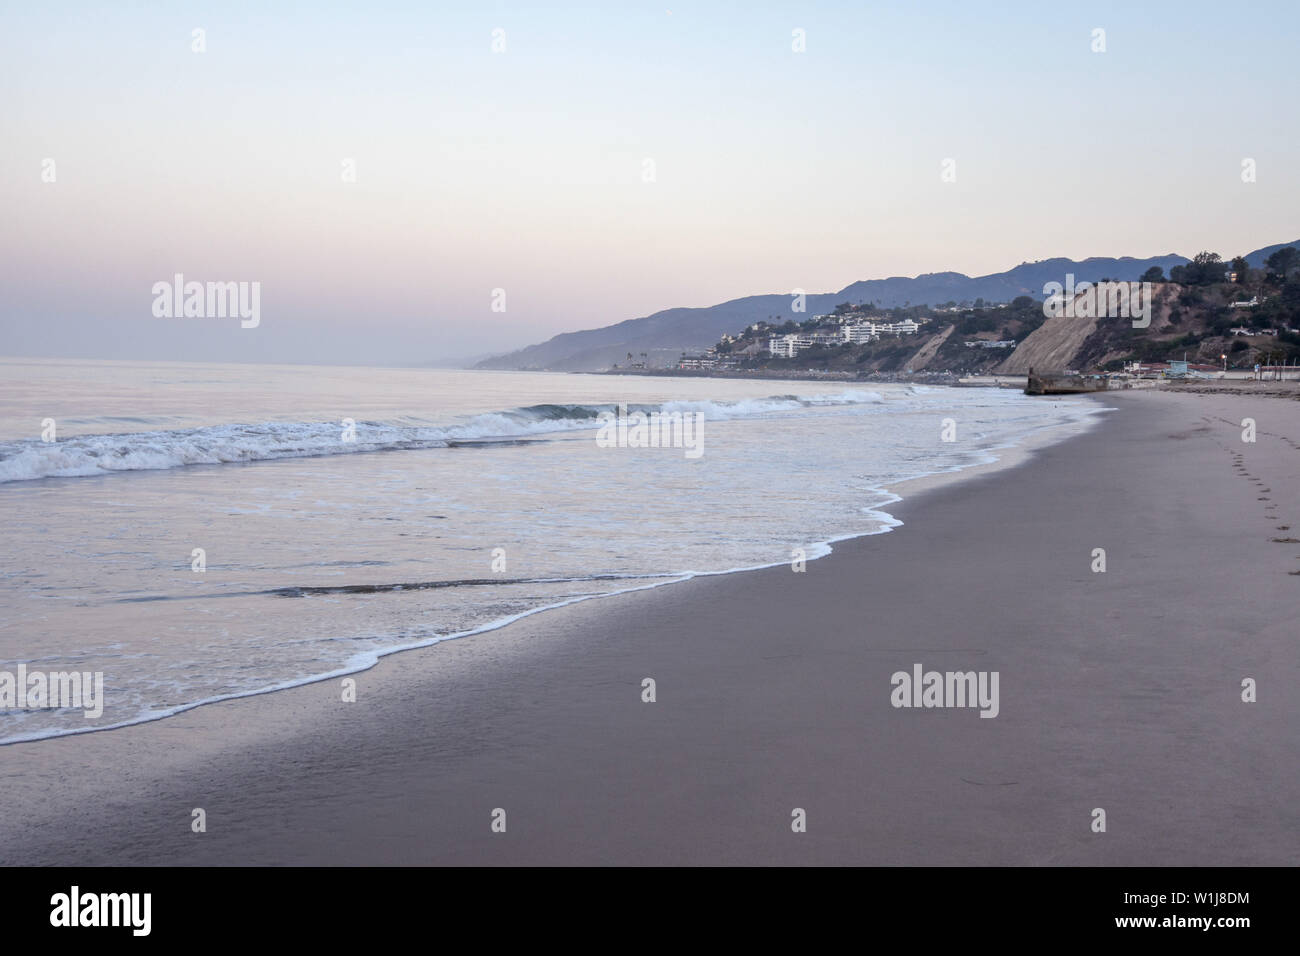 Santa Monica Beach at Sunrise - Stock Image